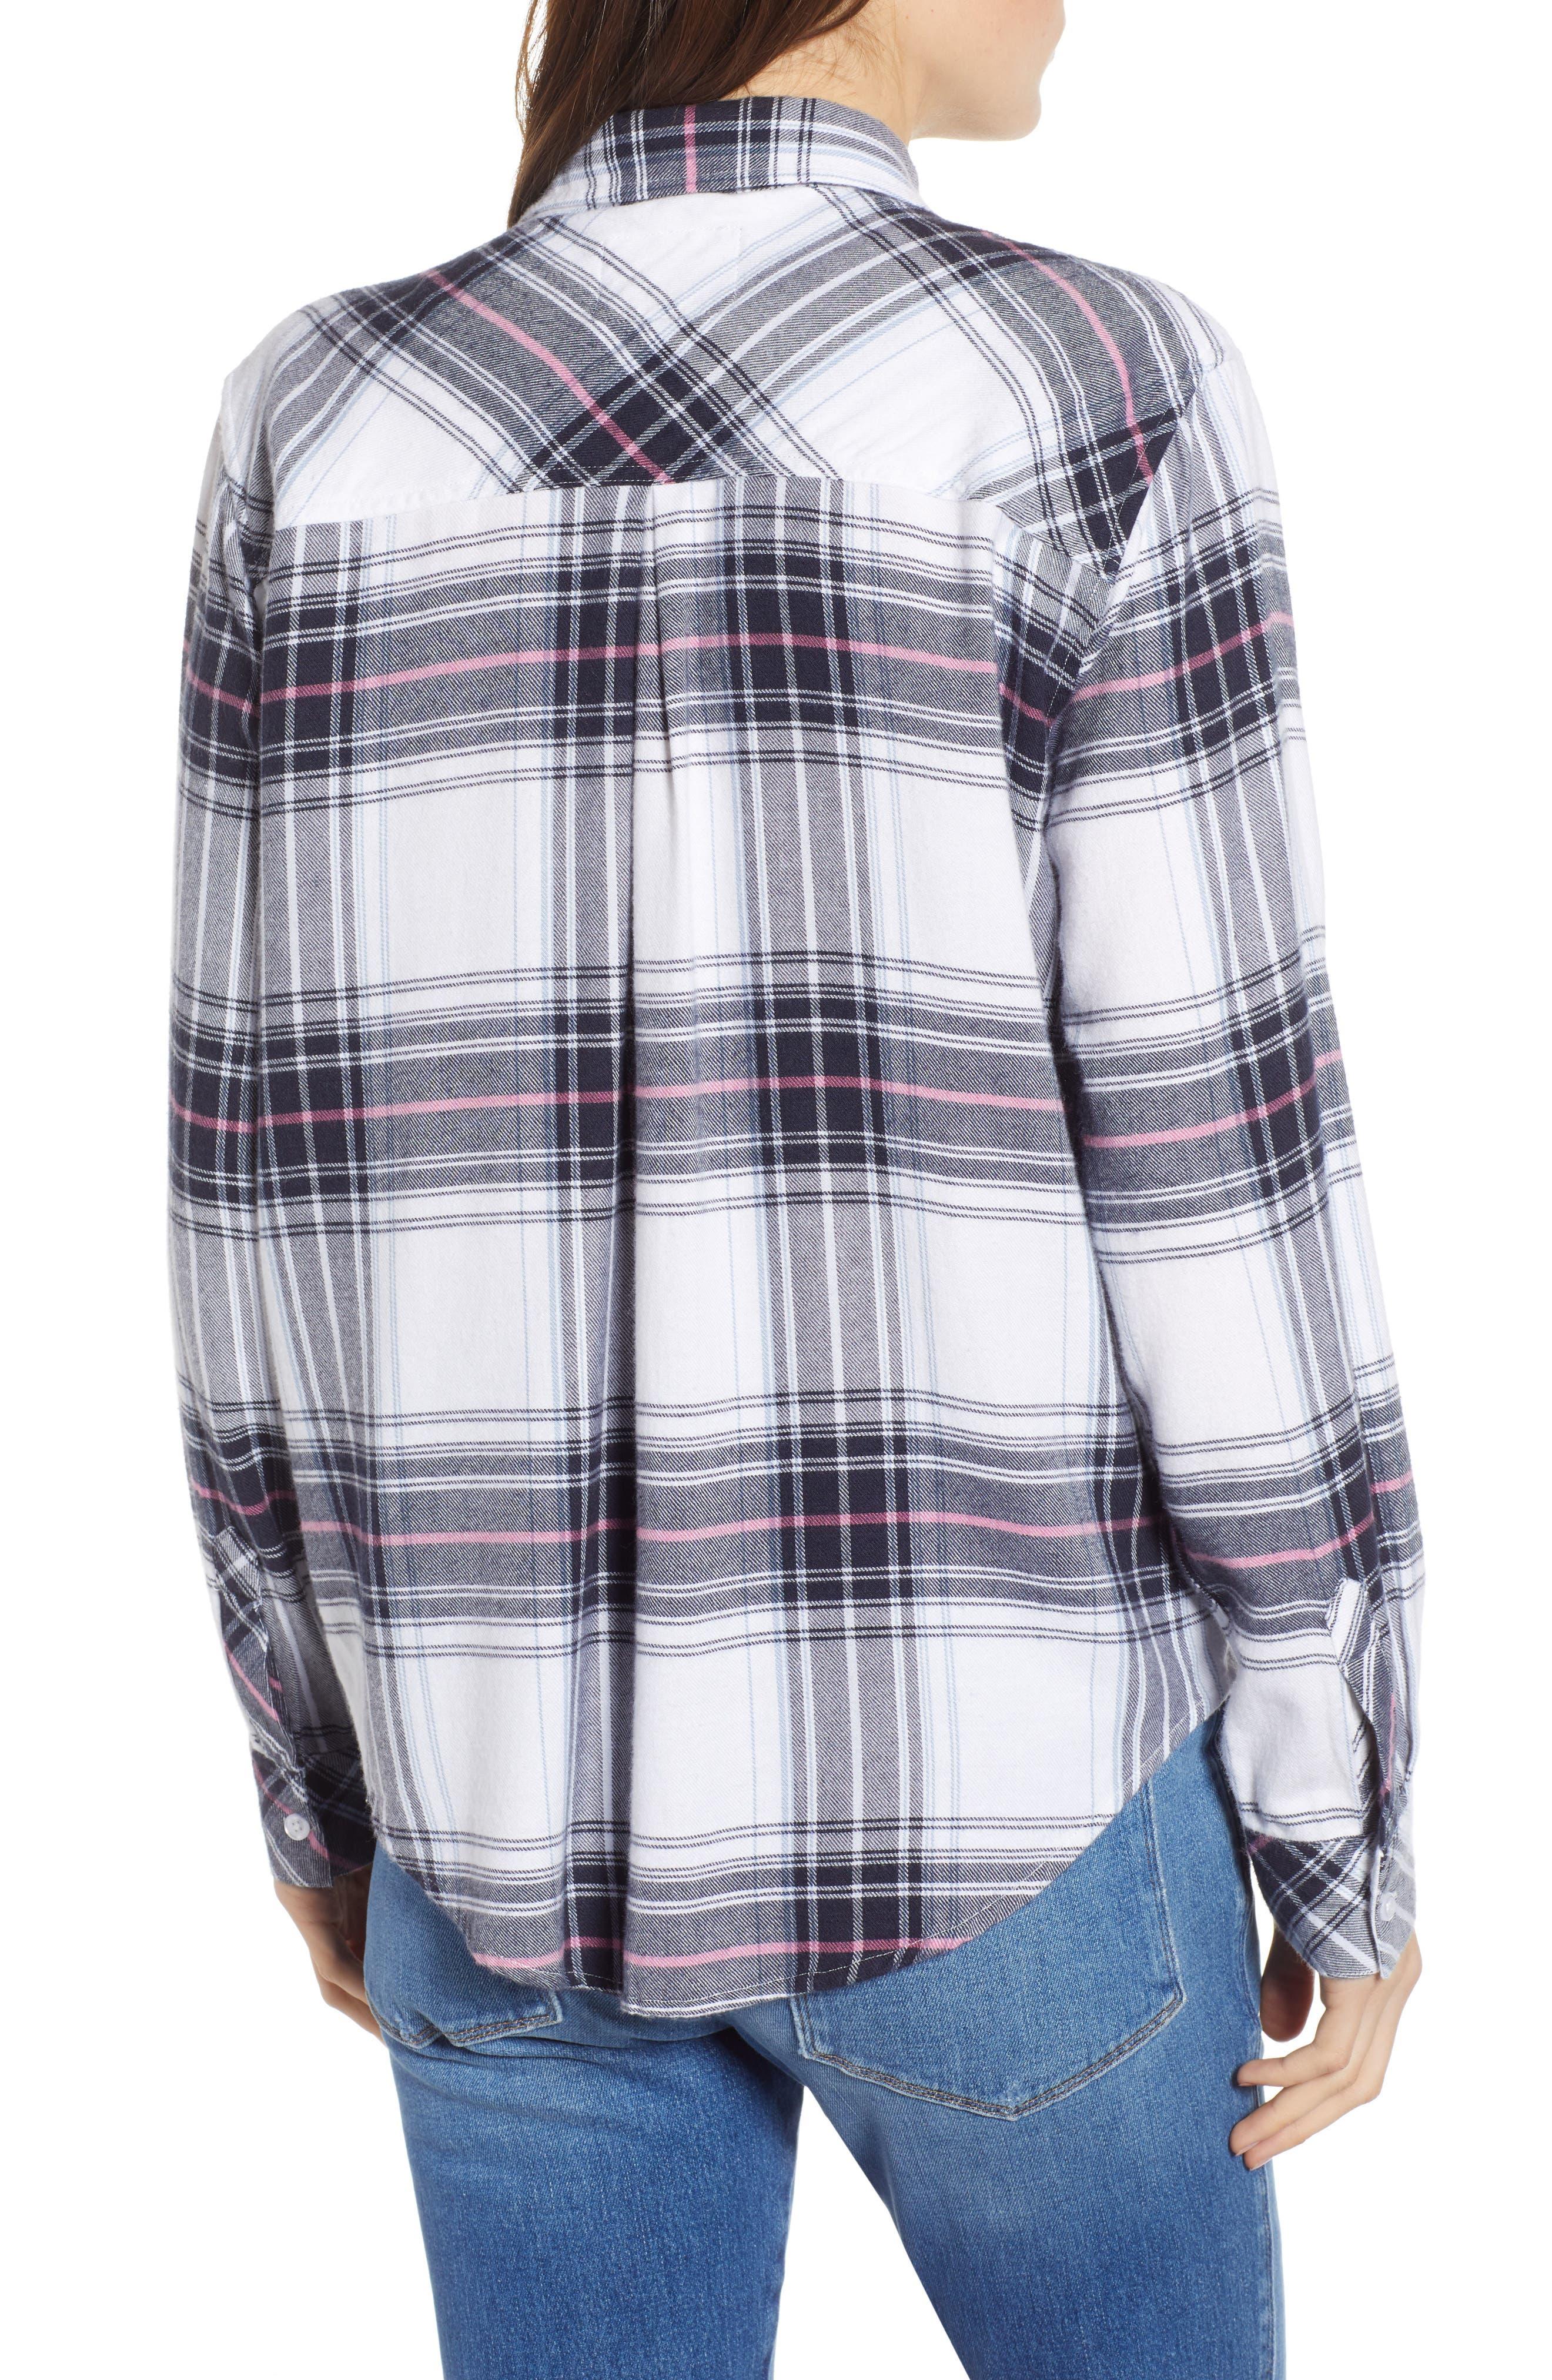 Milo Plaid Shirt,                             Alternate thumbnail 2, color,                             WHITE NAVY MAGENTA